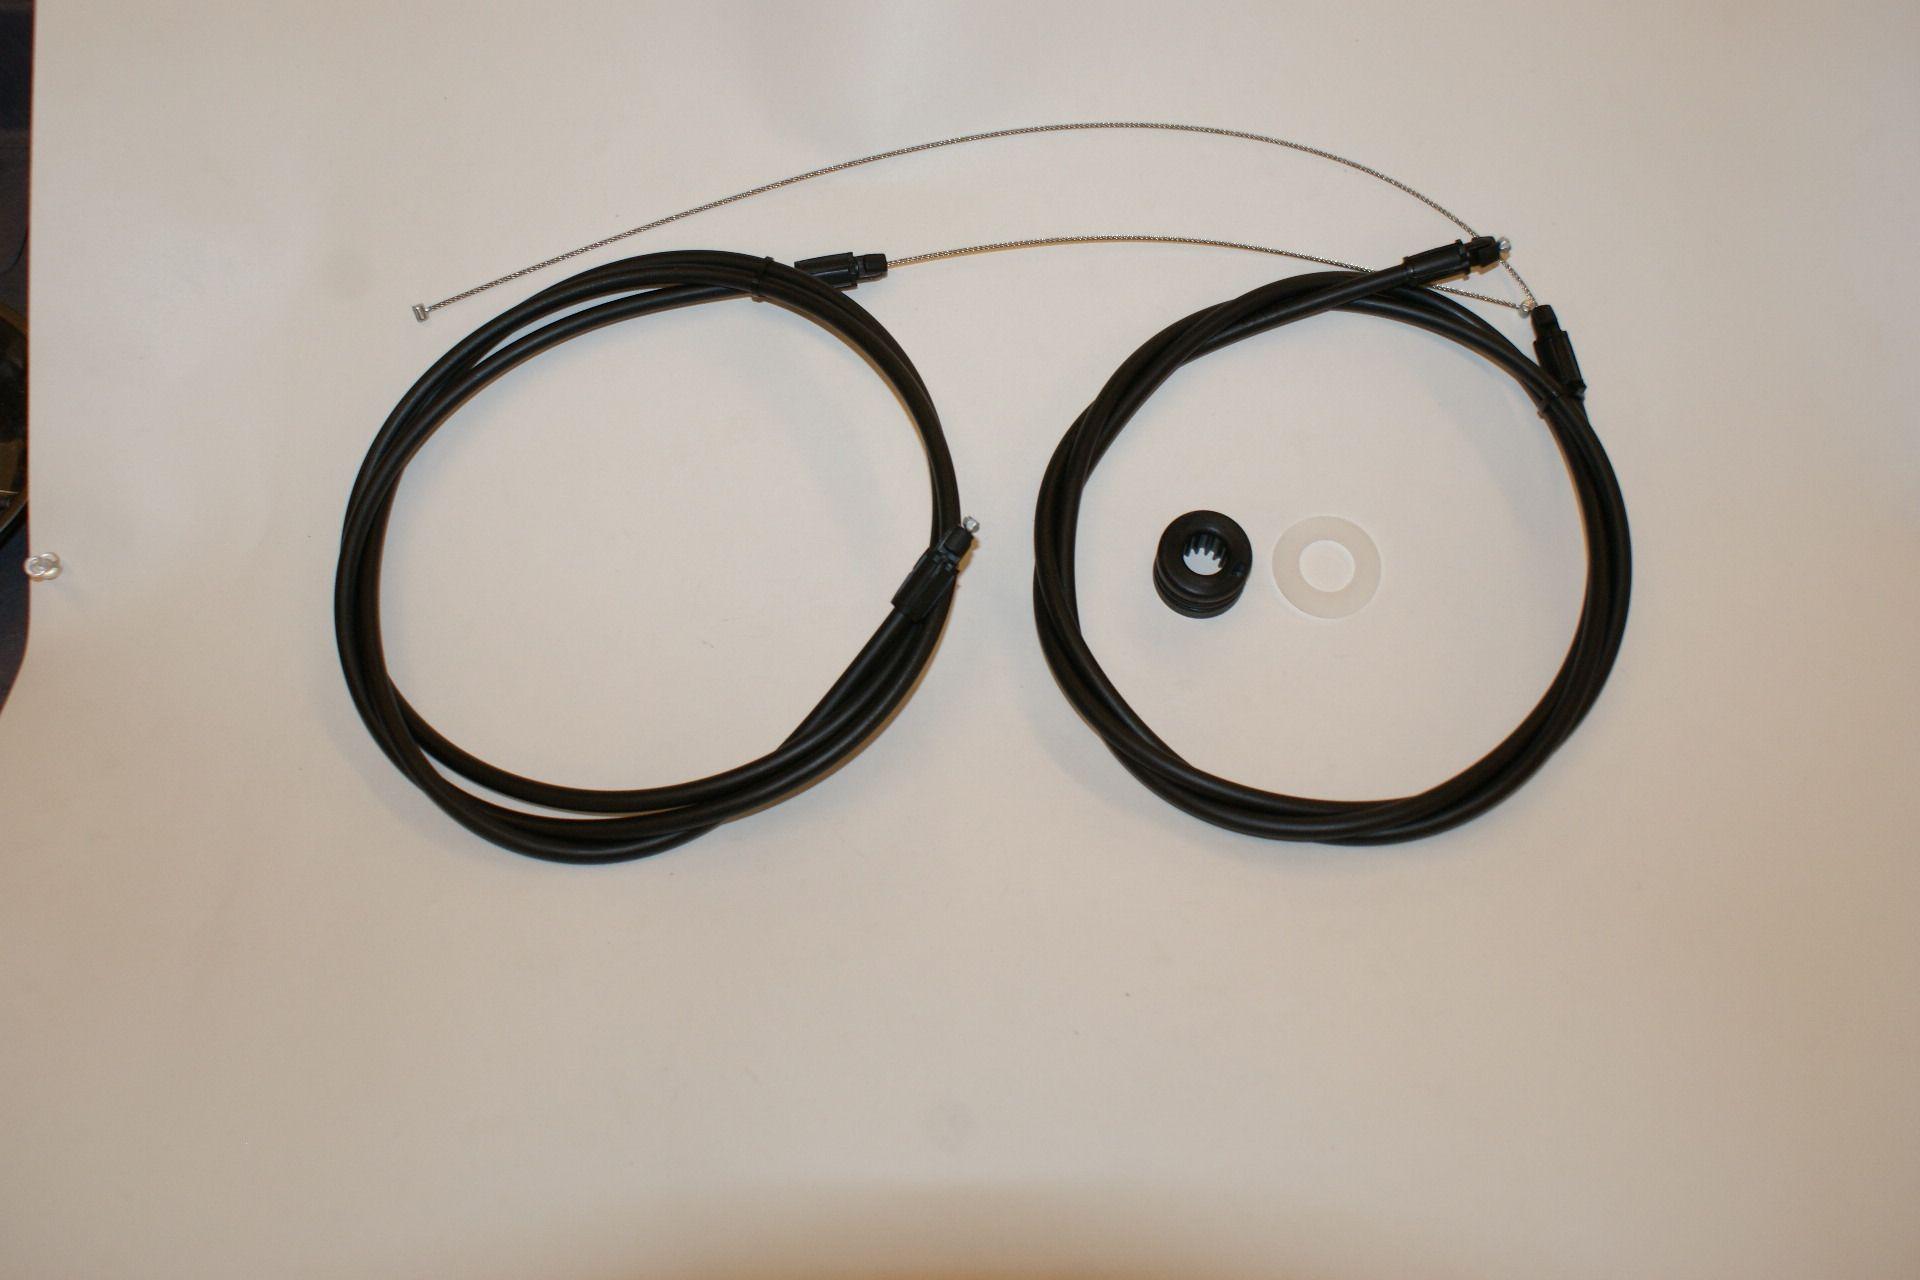 cable repair kit for minn kota maxxum trolling motors [ 1920 x 1280 Pixel ]